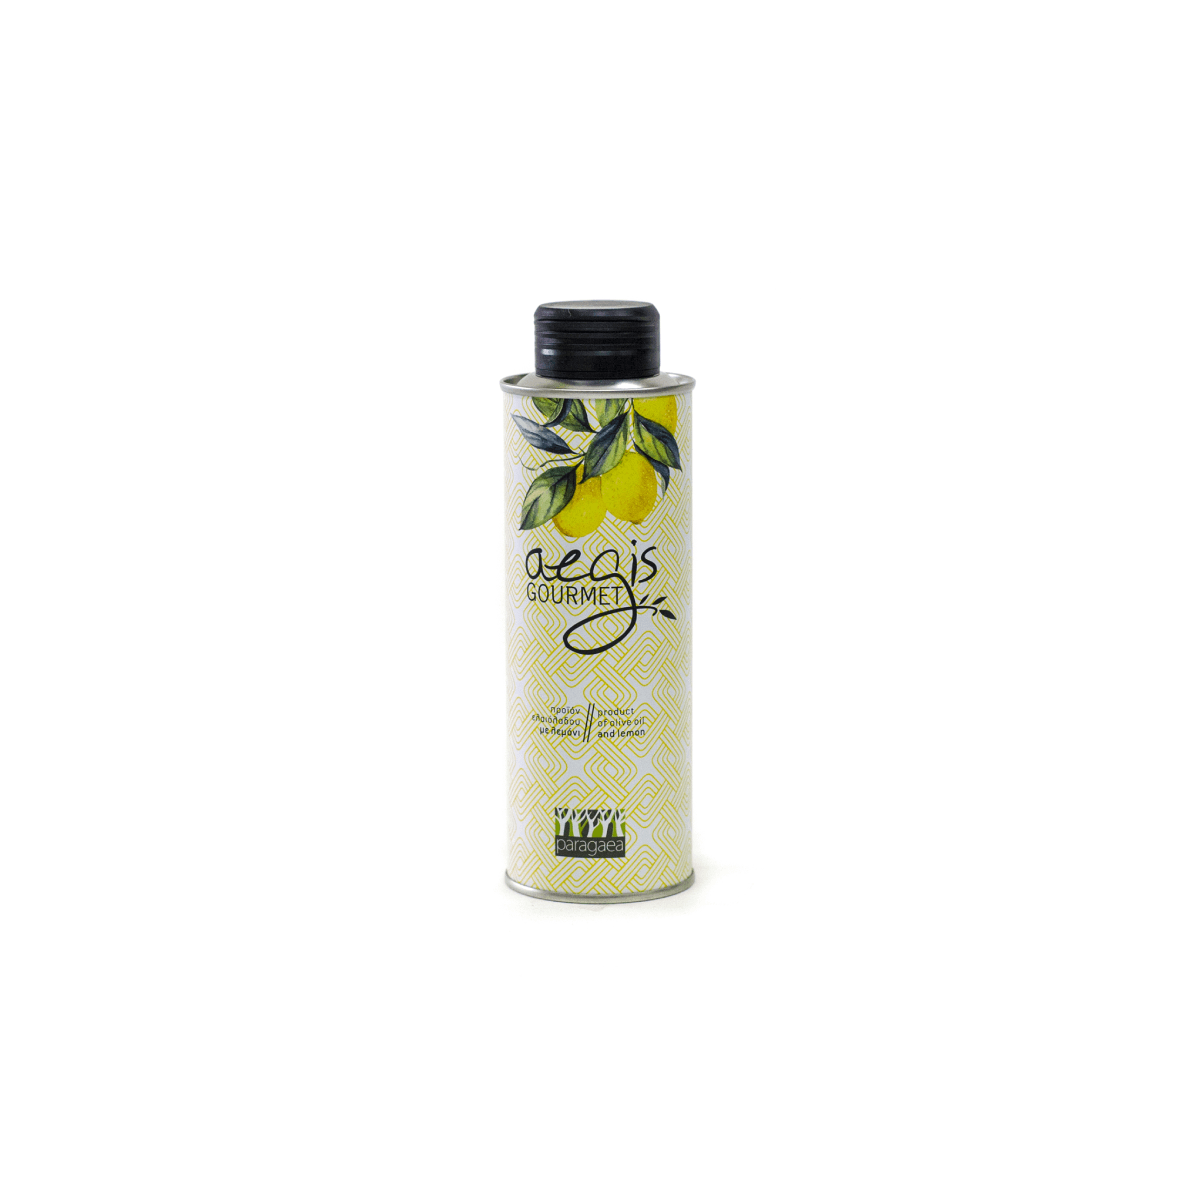 Lemon Flavored Olive Oil – Aegis Gourmet